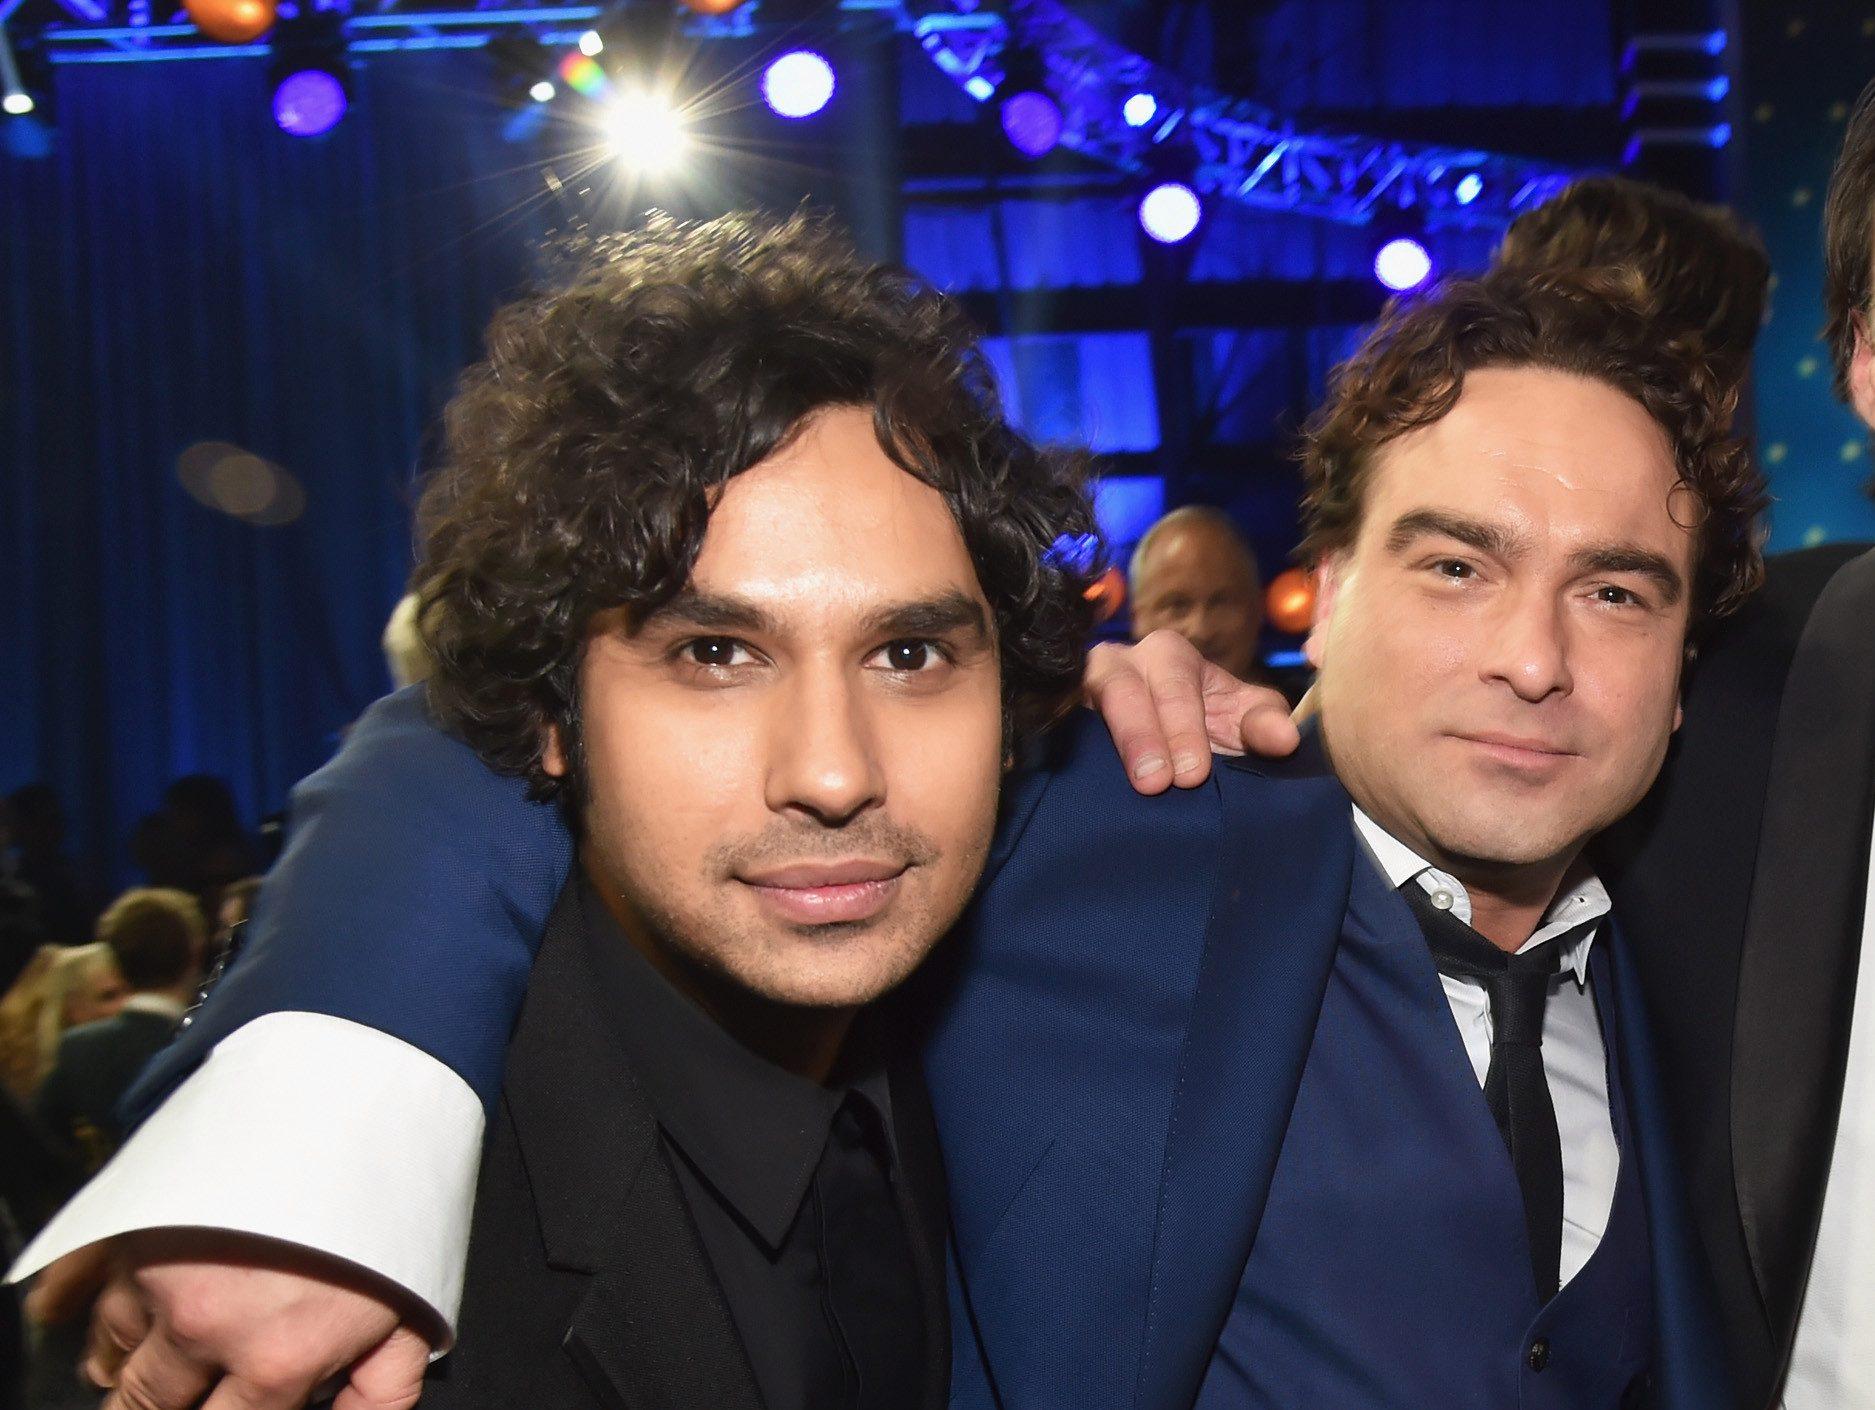 Kunal Nayyar and Johnny Galecki